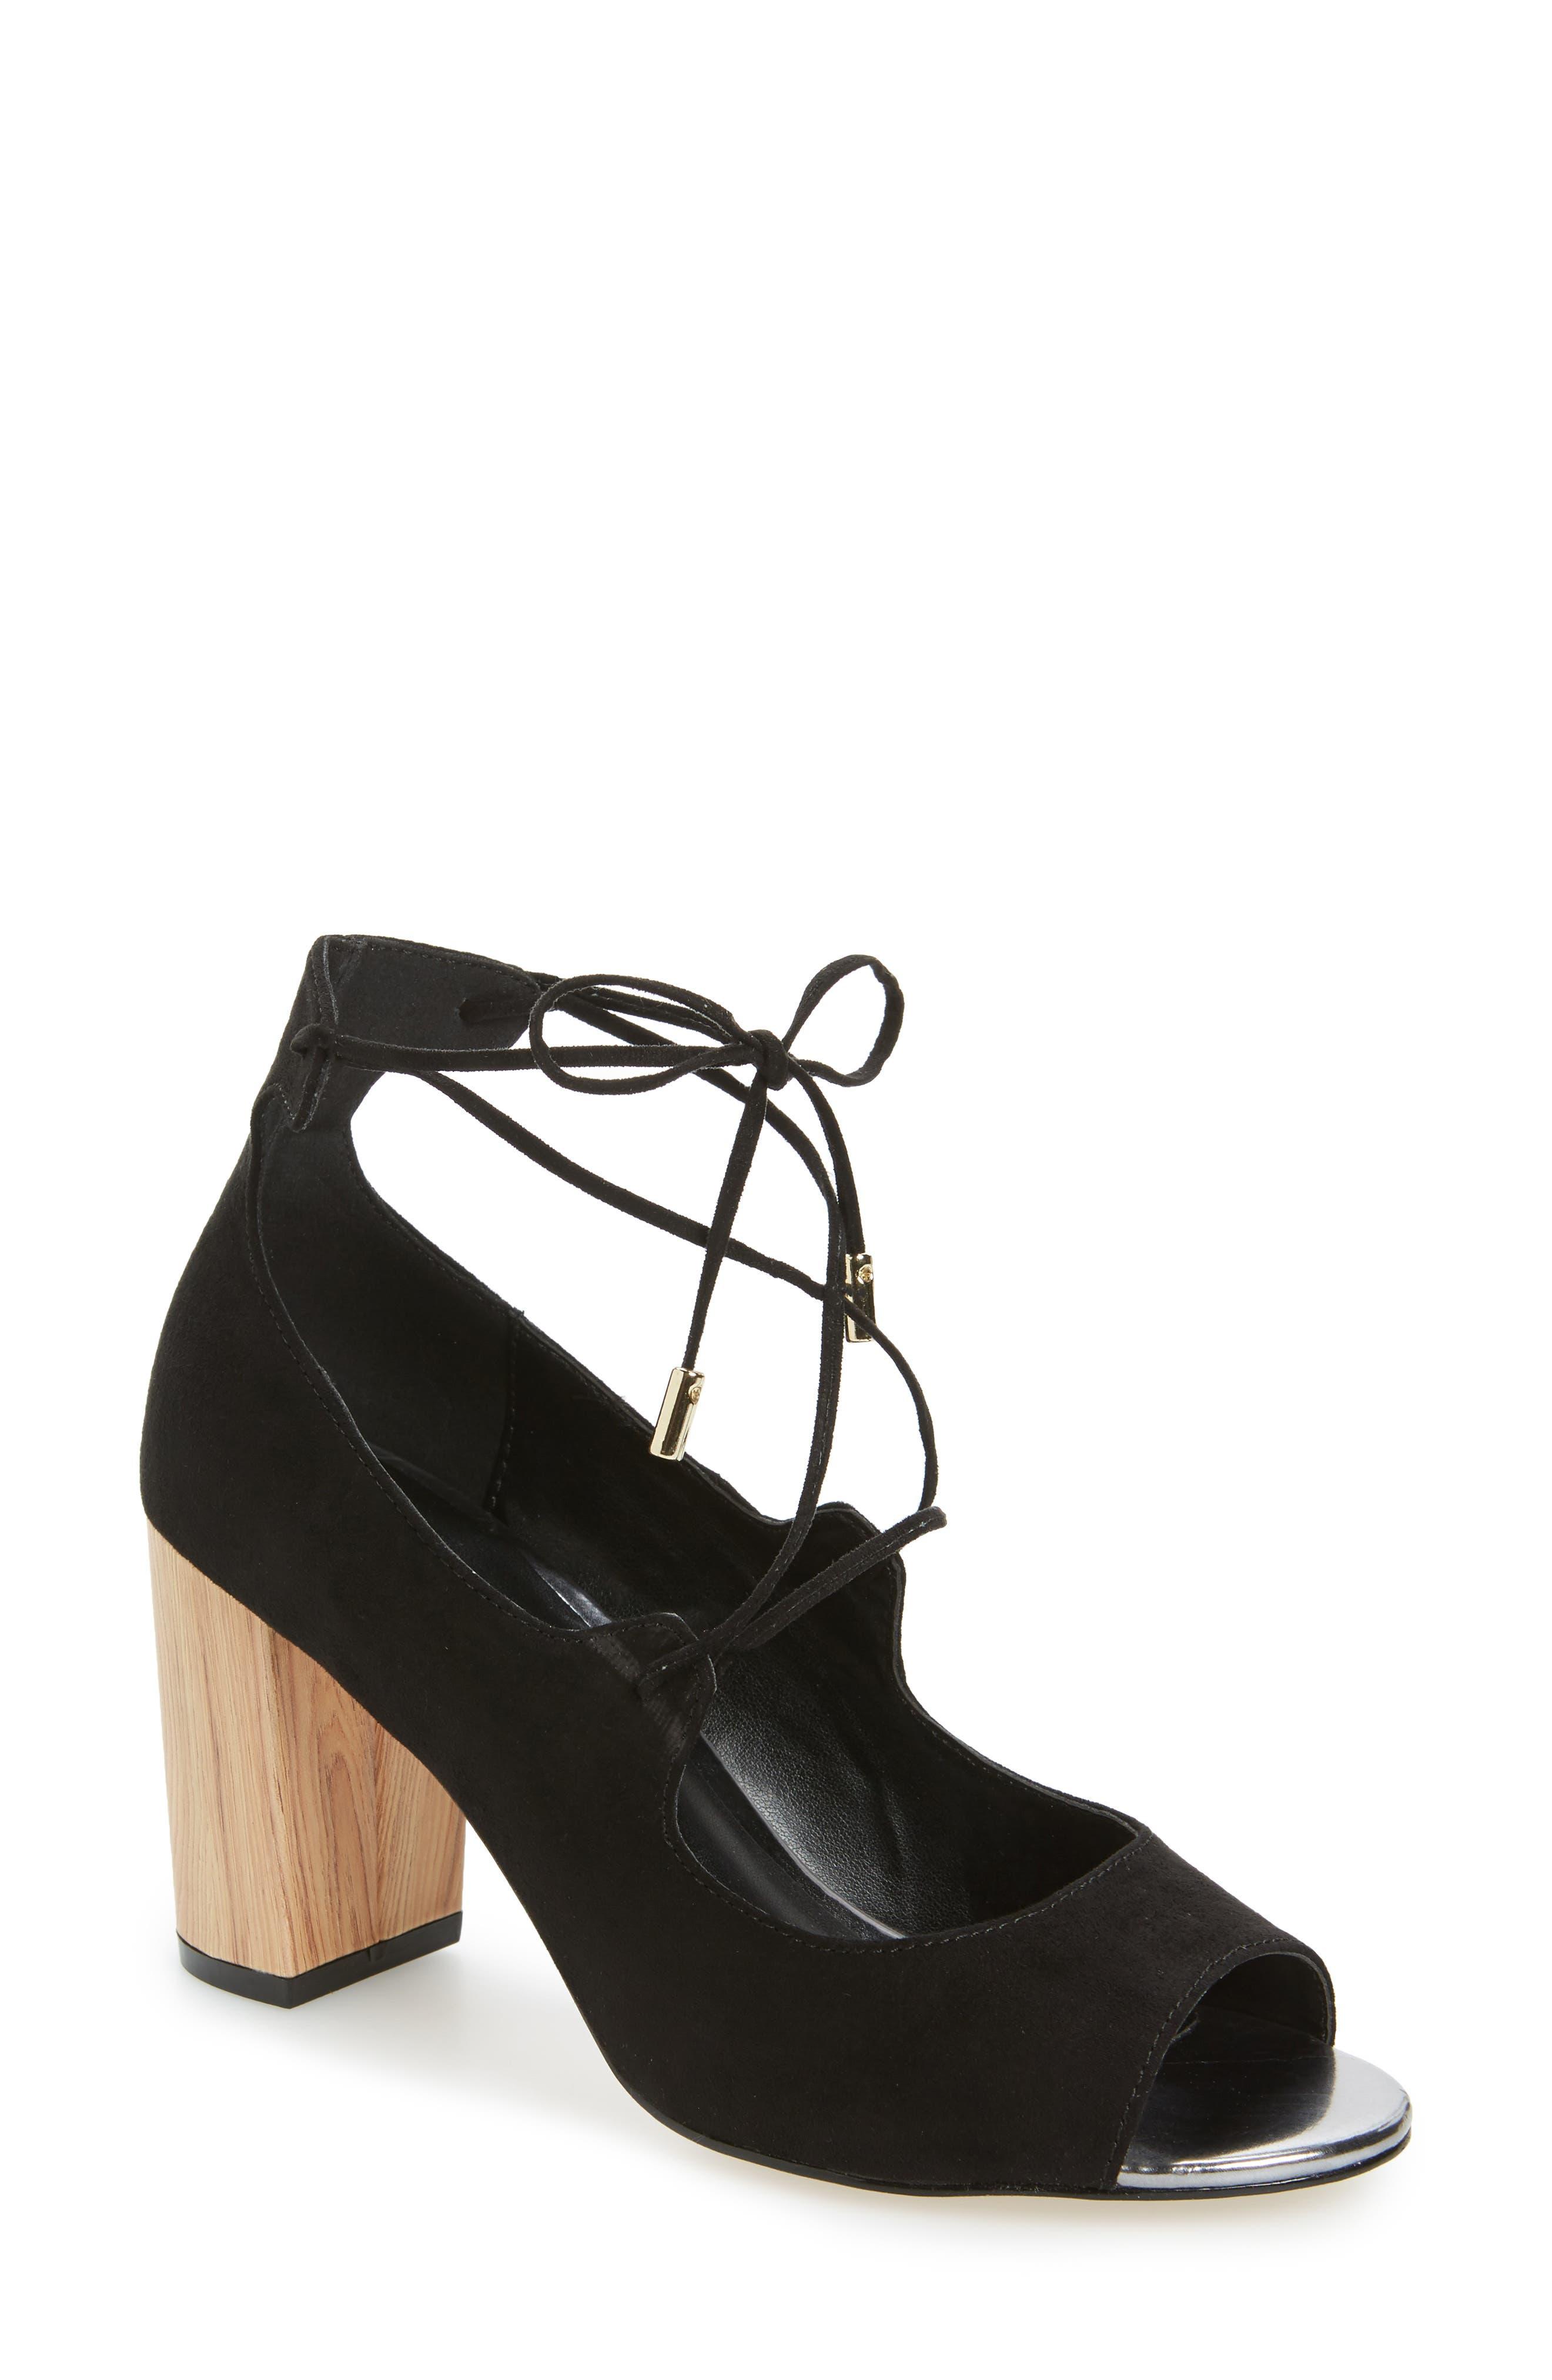 Vikki Block Heel Sandal,                             Main thumbnail 1, color,                             003